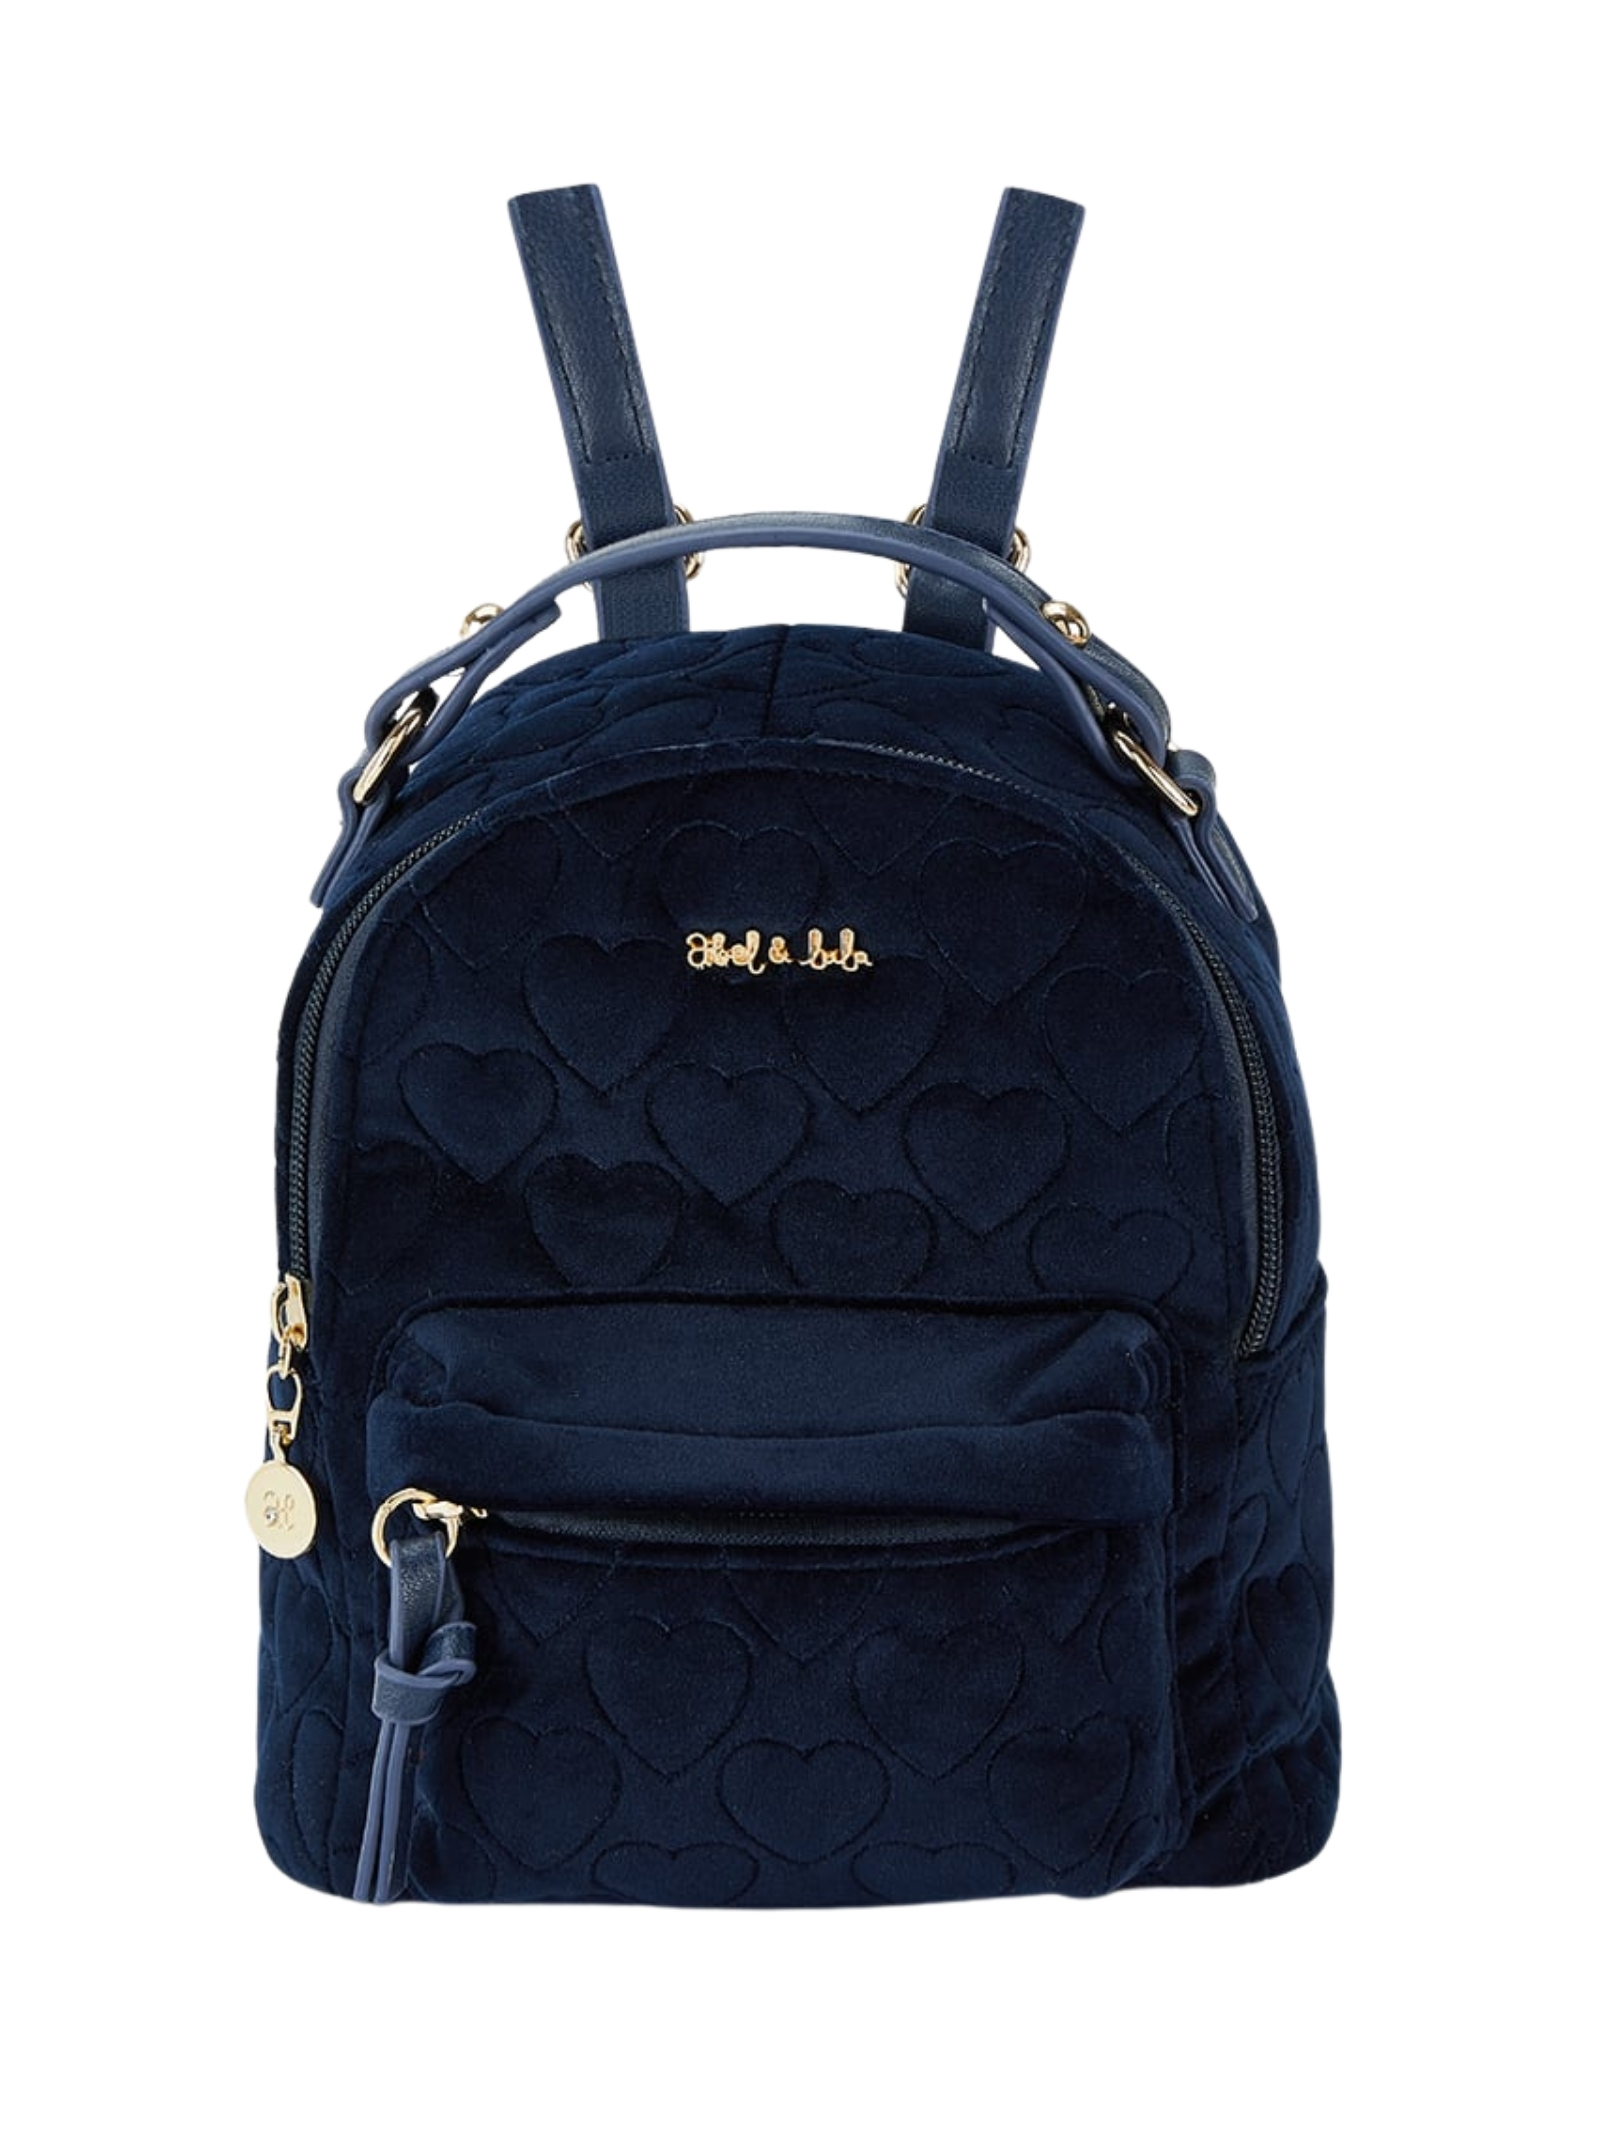 Love Marino Backpack ABEL&LULA | Backpacks | 5918069